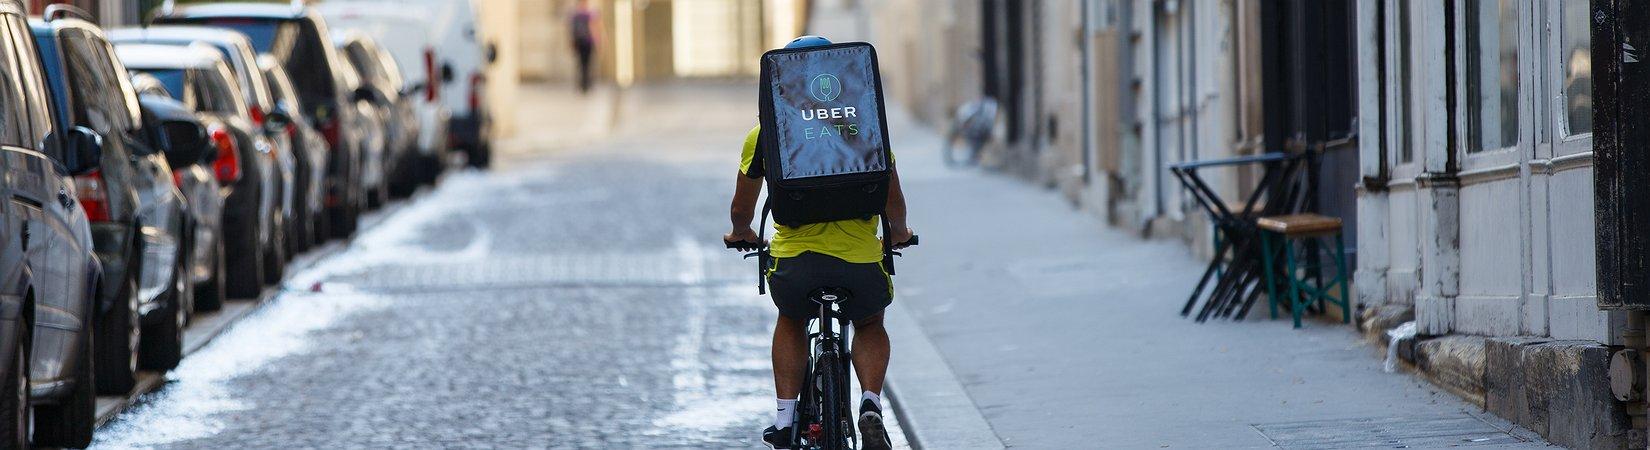 SoftBank investe 10 miliardi di dollari in Uber